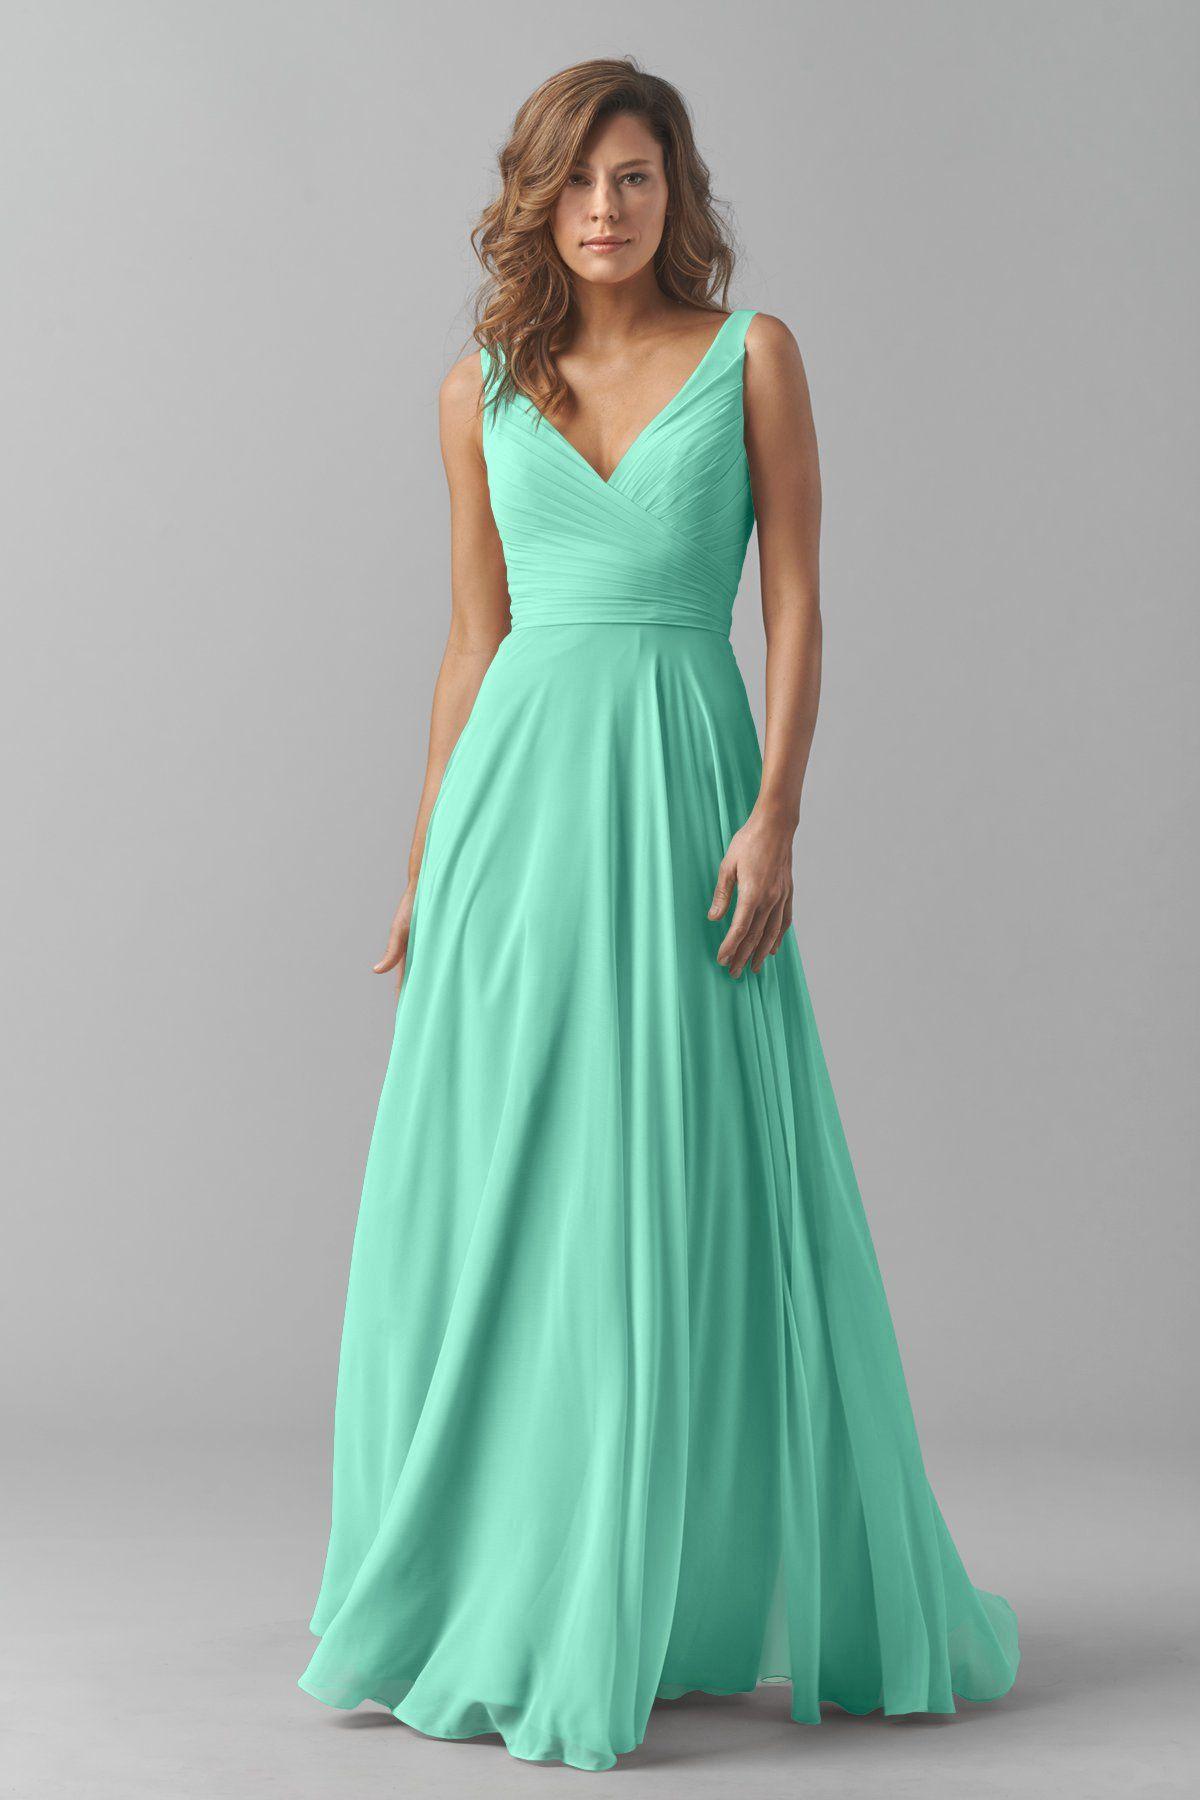 Watters Maids Dress Karen | The Future Mr. & Mrs. Klinge | Pinterest ...